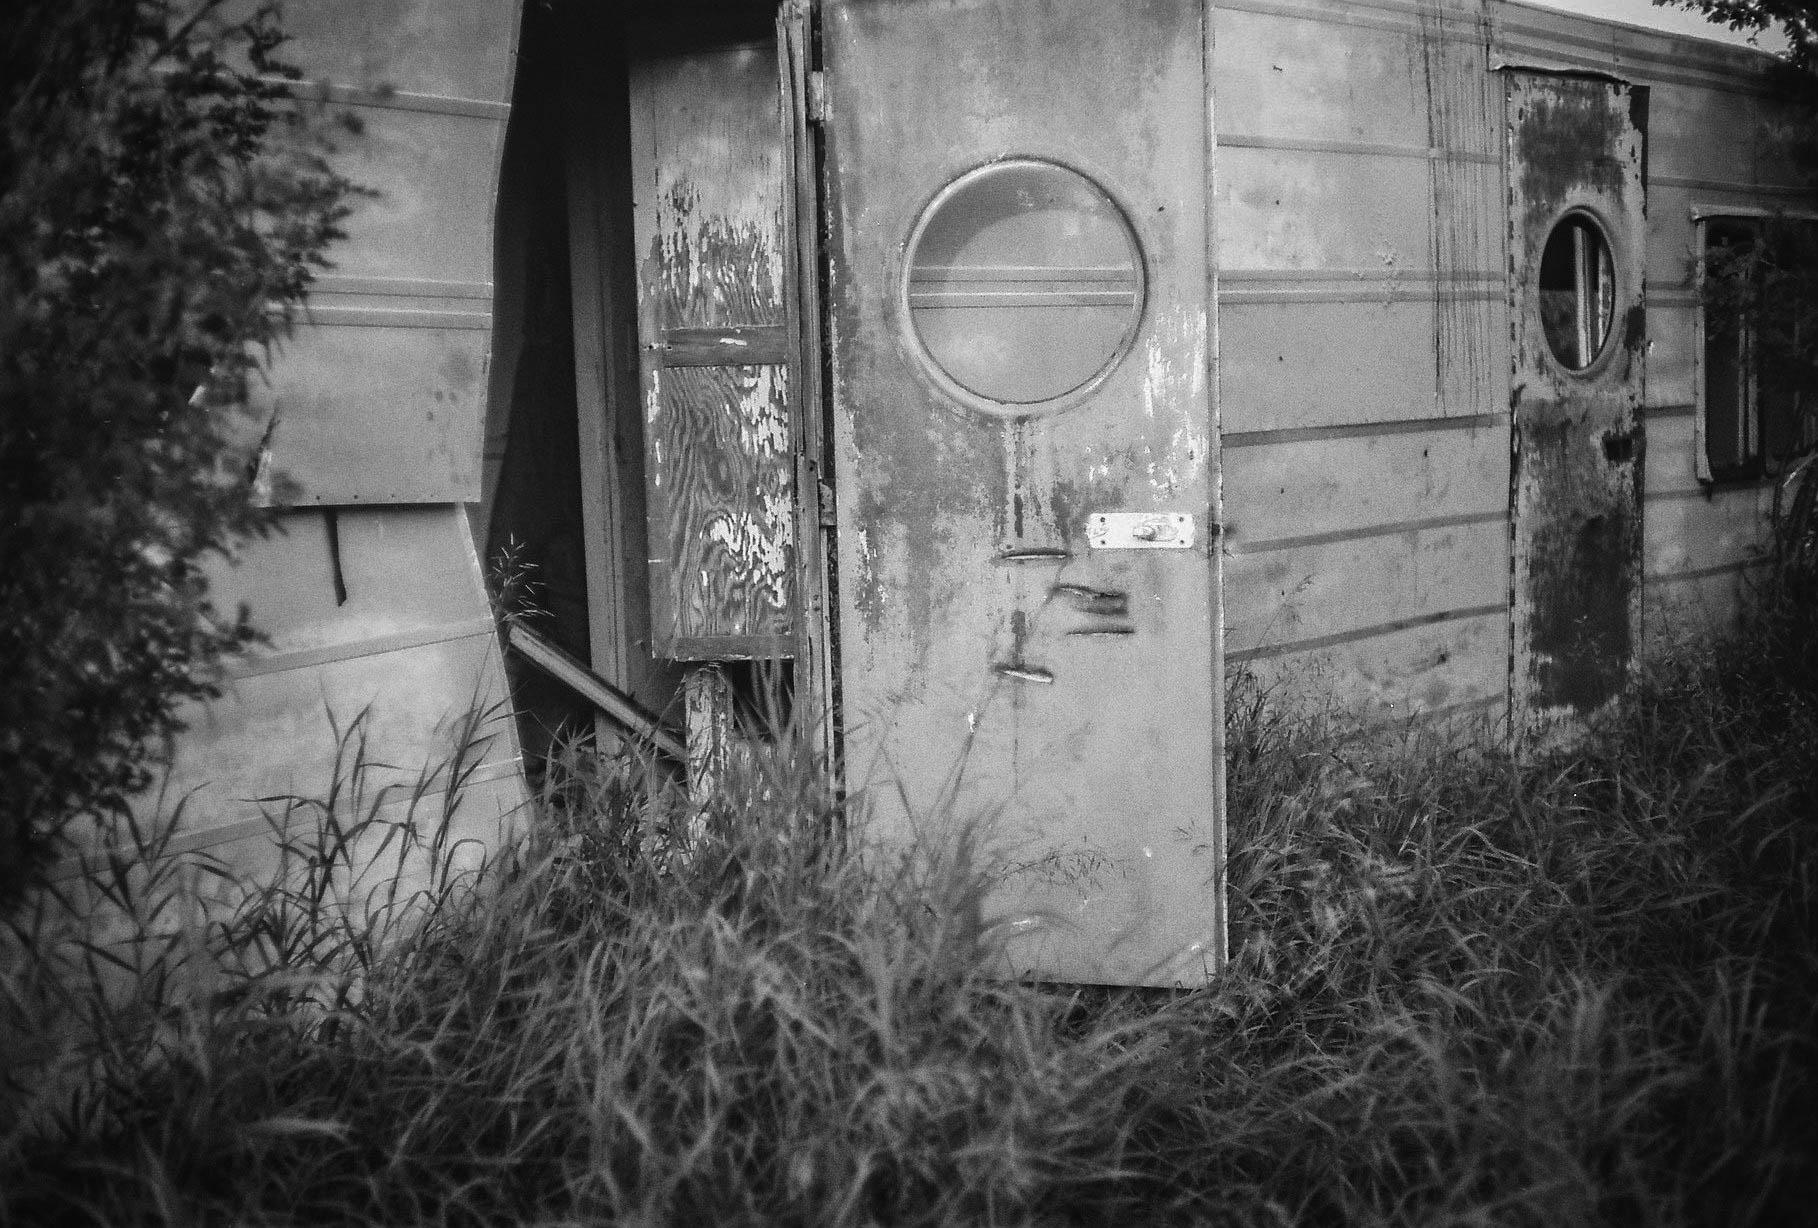 Abandoned trailer Bulwark, Alberta Leica M3, Canon 50mm F1.4 Ilford Pan F Plus 50 film 7.16